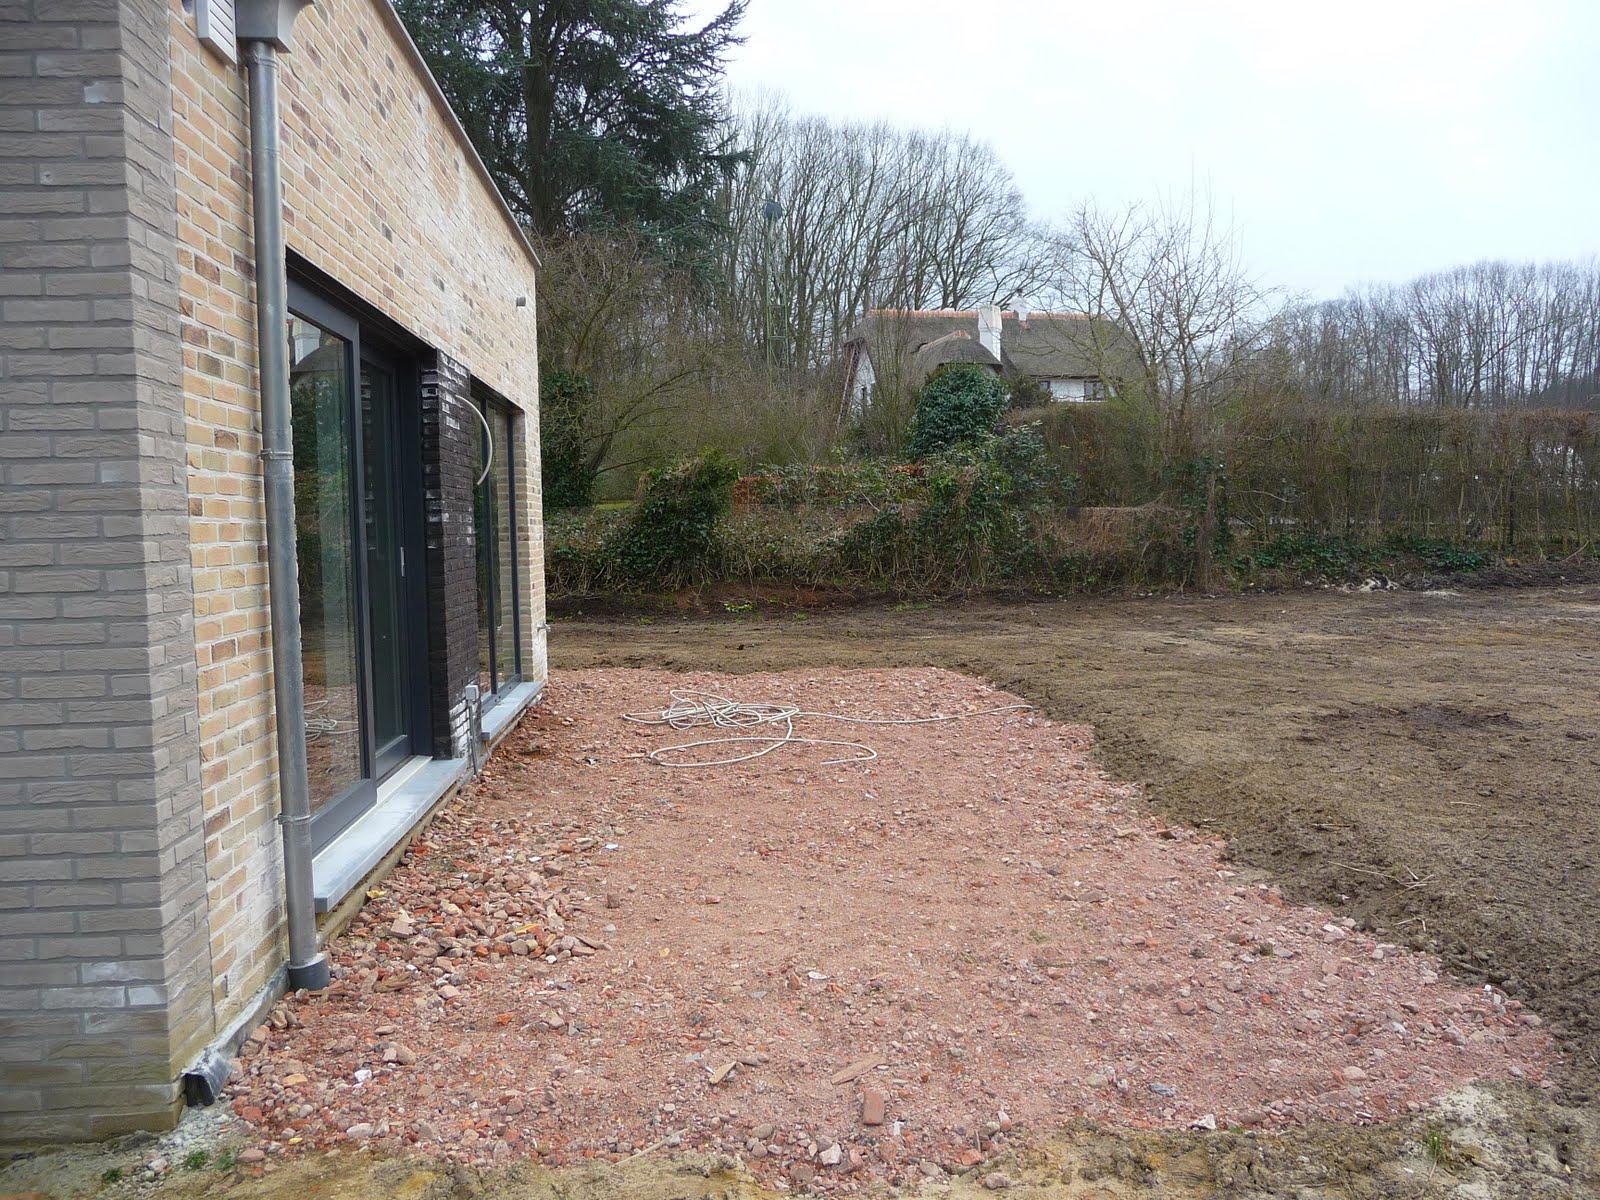 Brien steven bouwen tuin trap for Trap bouwen